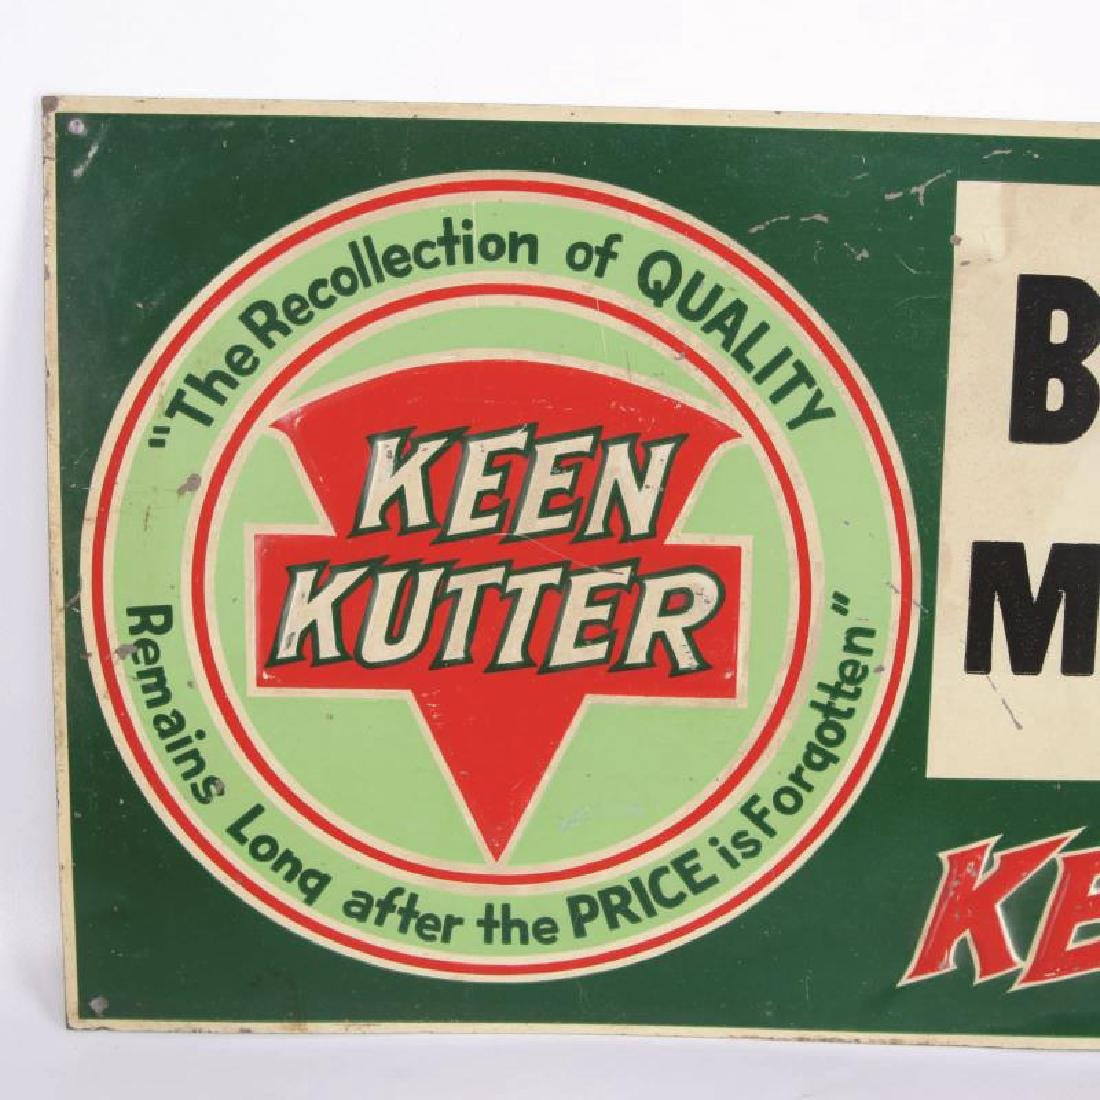 A VINTAGE KEEN KUTTER ENAMEL ADVERTISING SIGN - 2